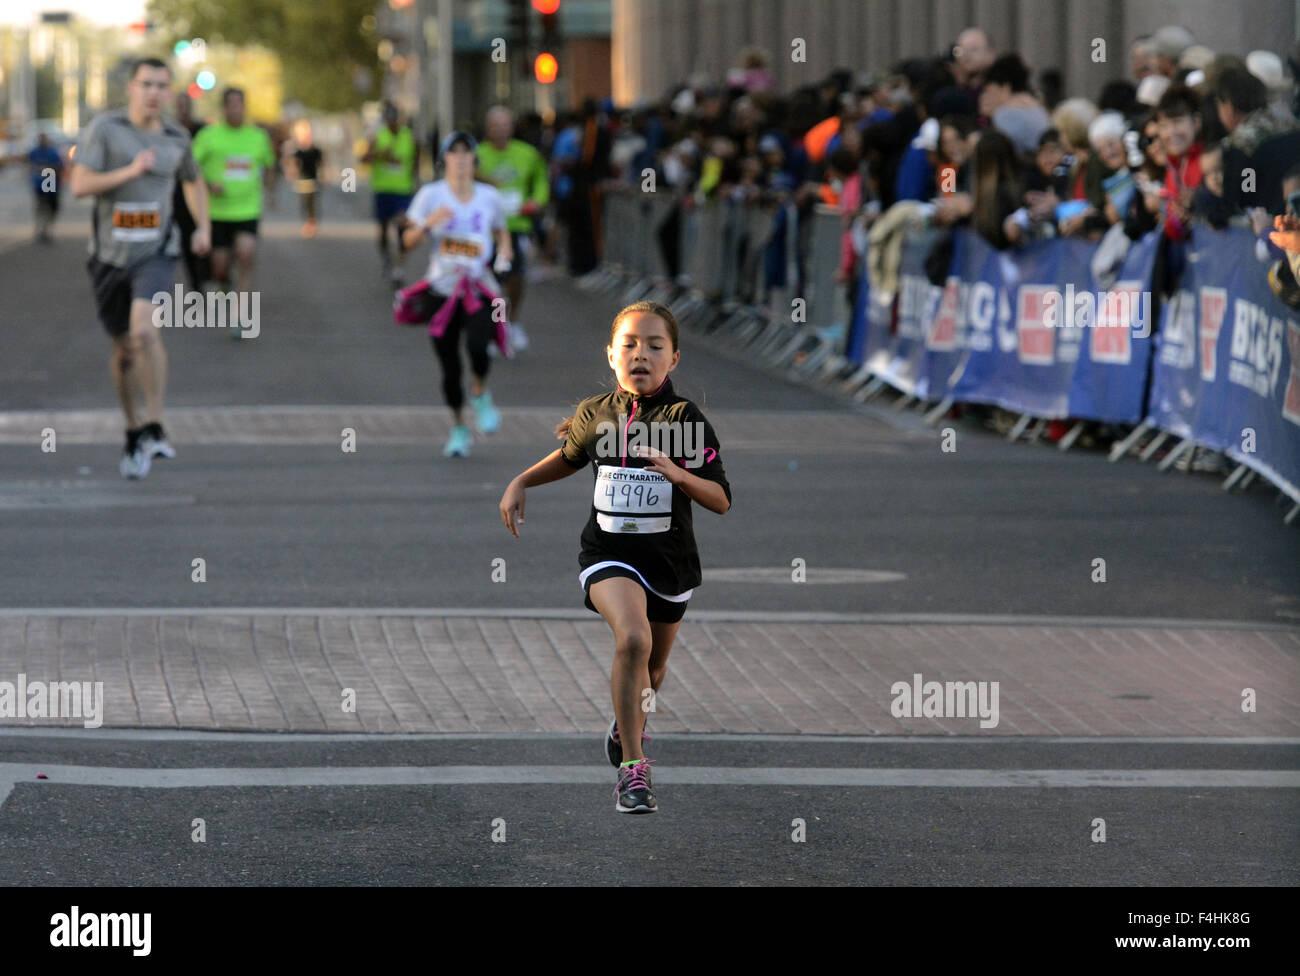 Albuquerque, USA. 18. Oktober 2015. Sport - Laufen Sie Leah Varela ...